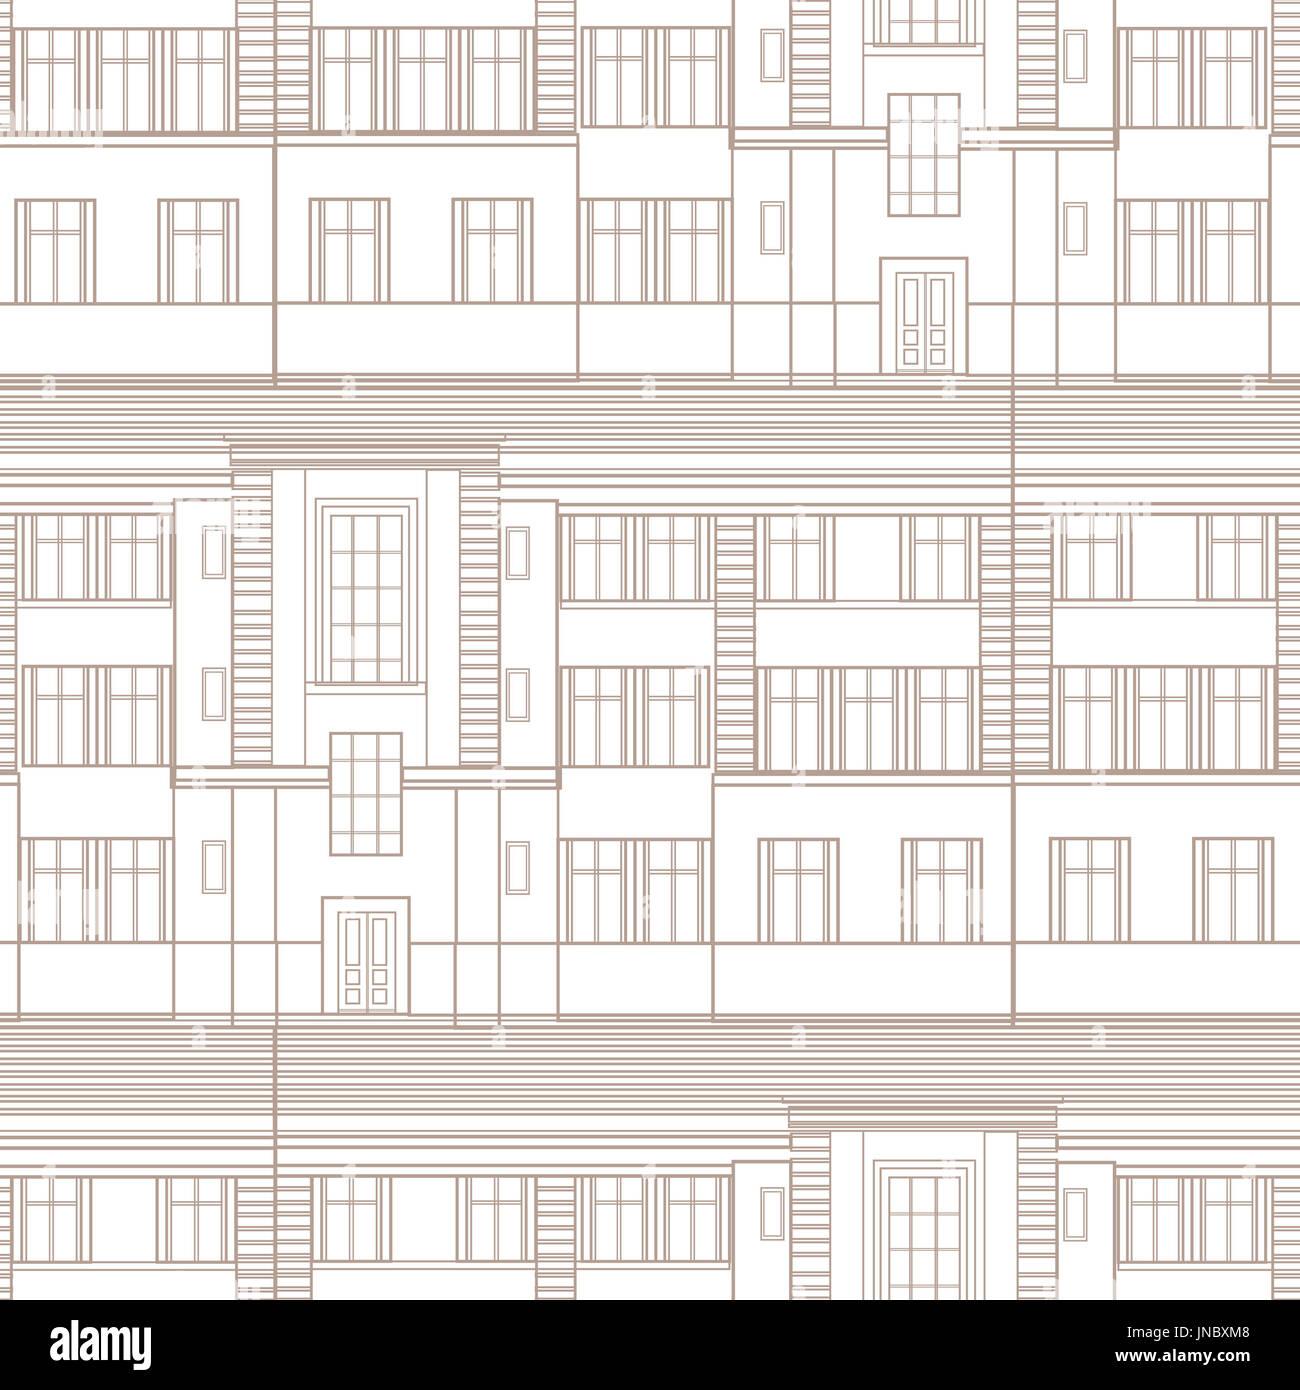 Building facade seamless pattern city architectural blueprint line building facade seamless pattern city architectural blueprint line background design element malvernweather Images